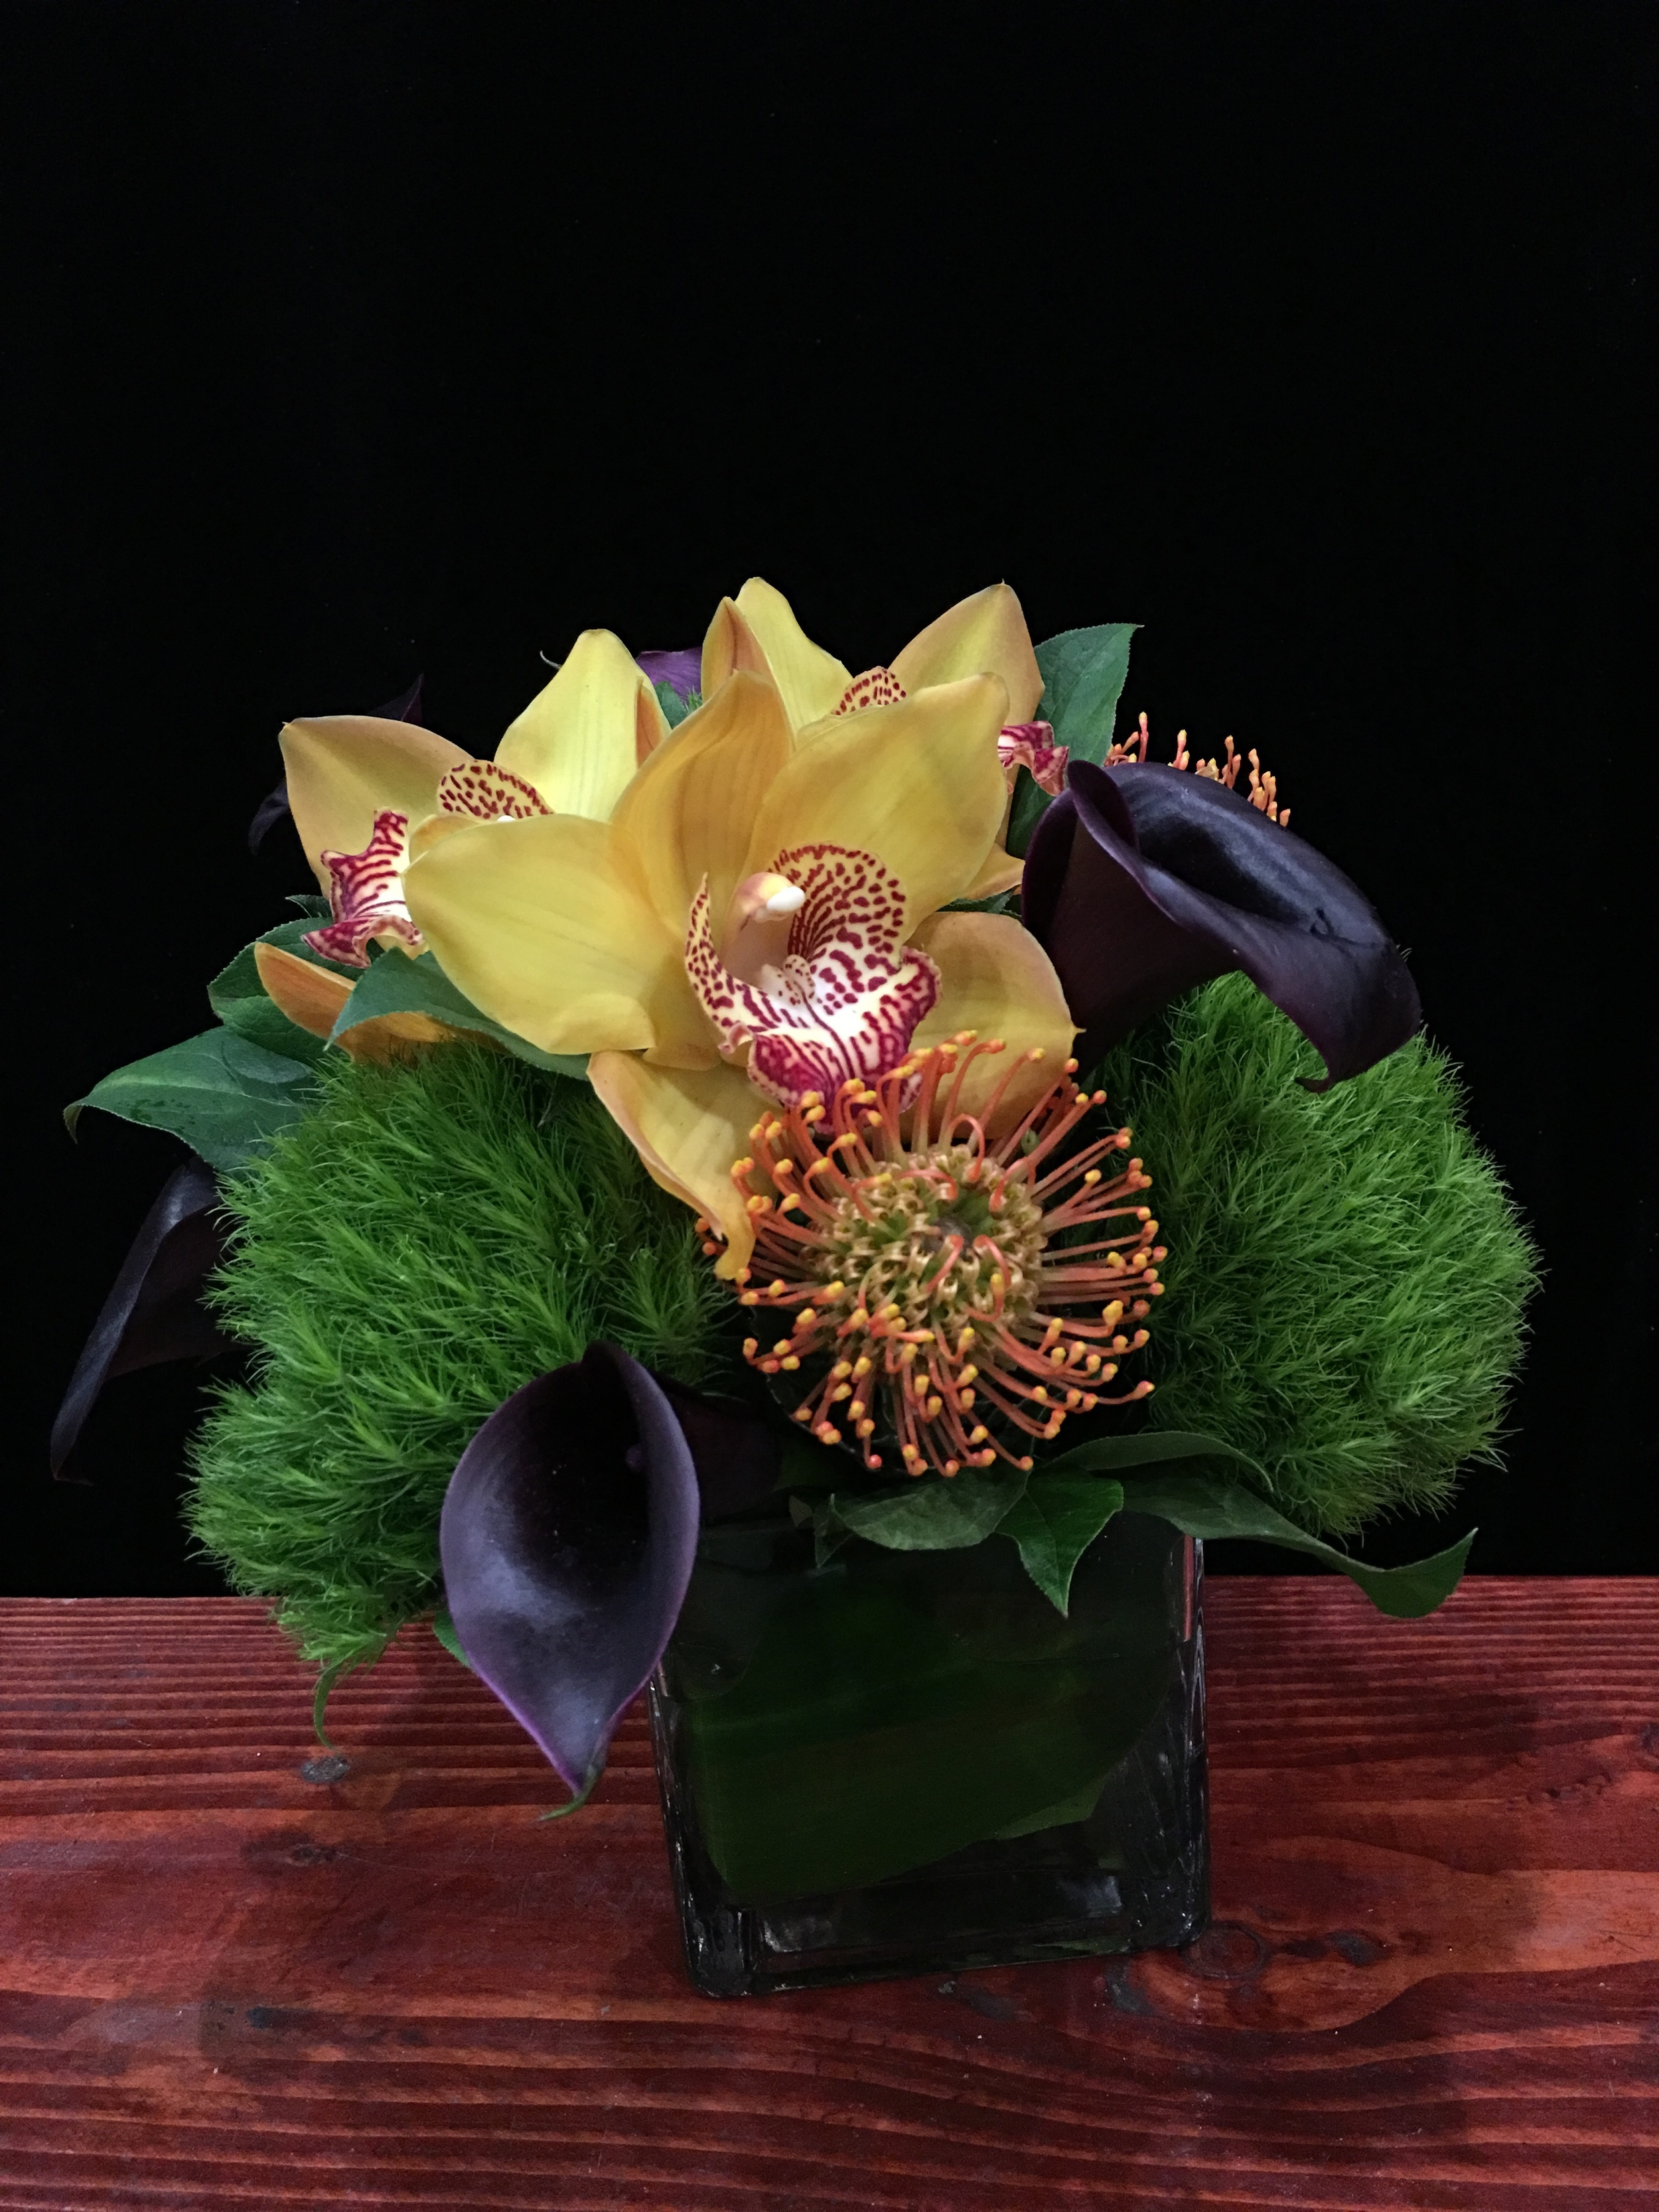 Eggplant Calla Lilies, Orange Pincushion, Yellow Cymbidium Orchids, & Dianthus